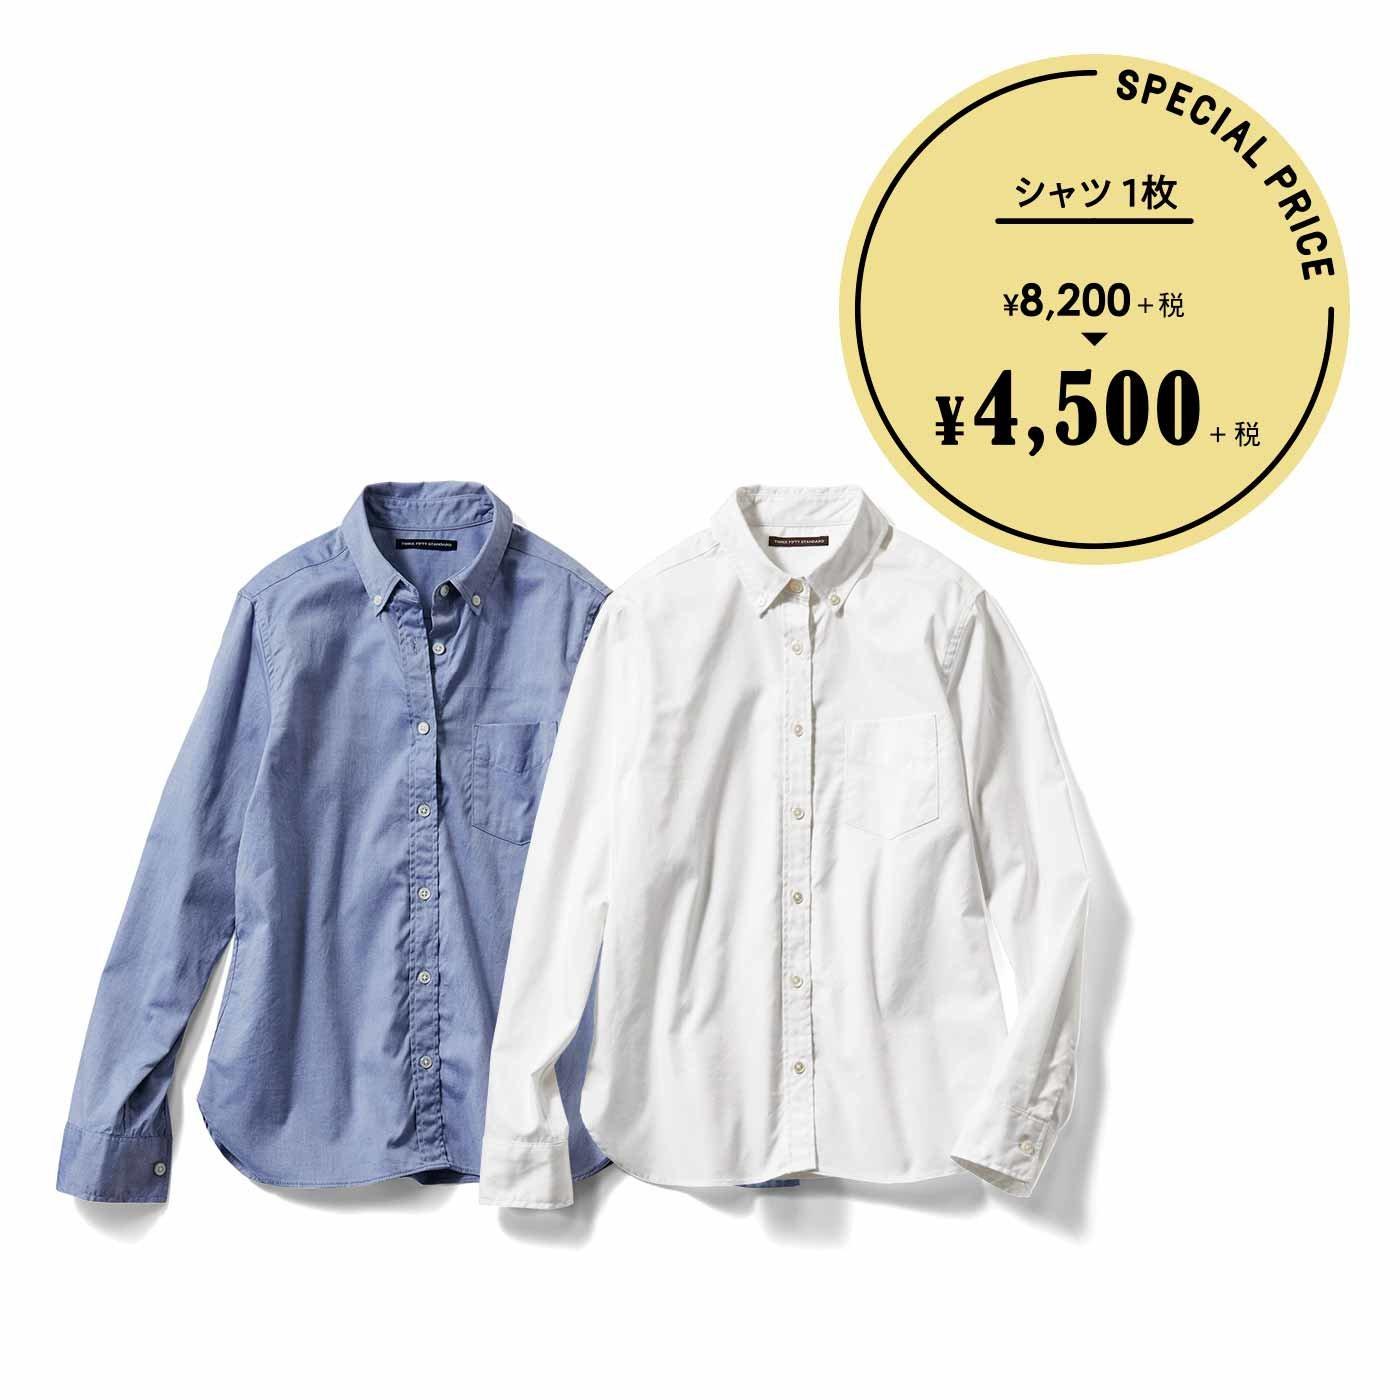 THREE FIFTY STANDARD 日本製の定番ボタンダウンシャツ